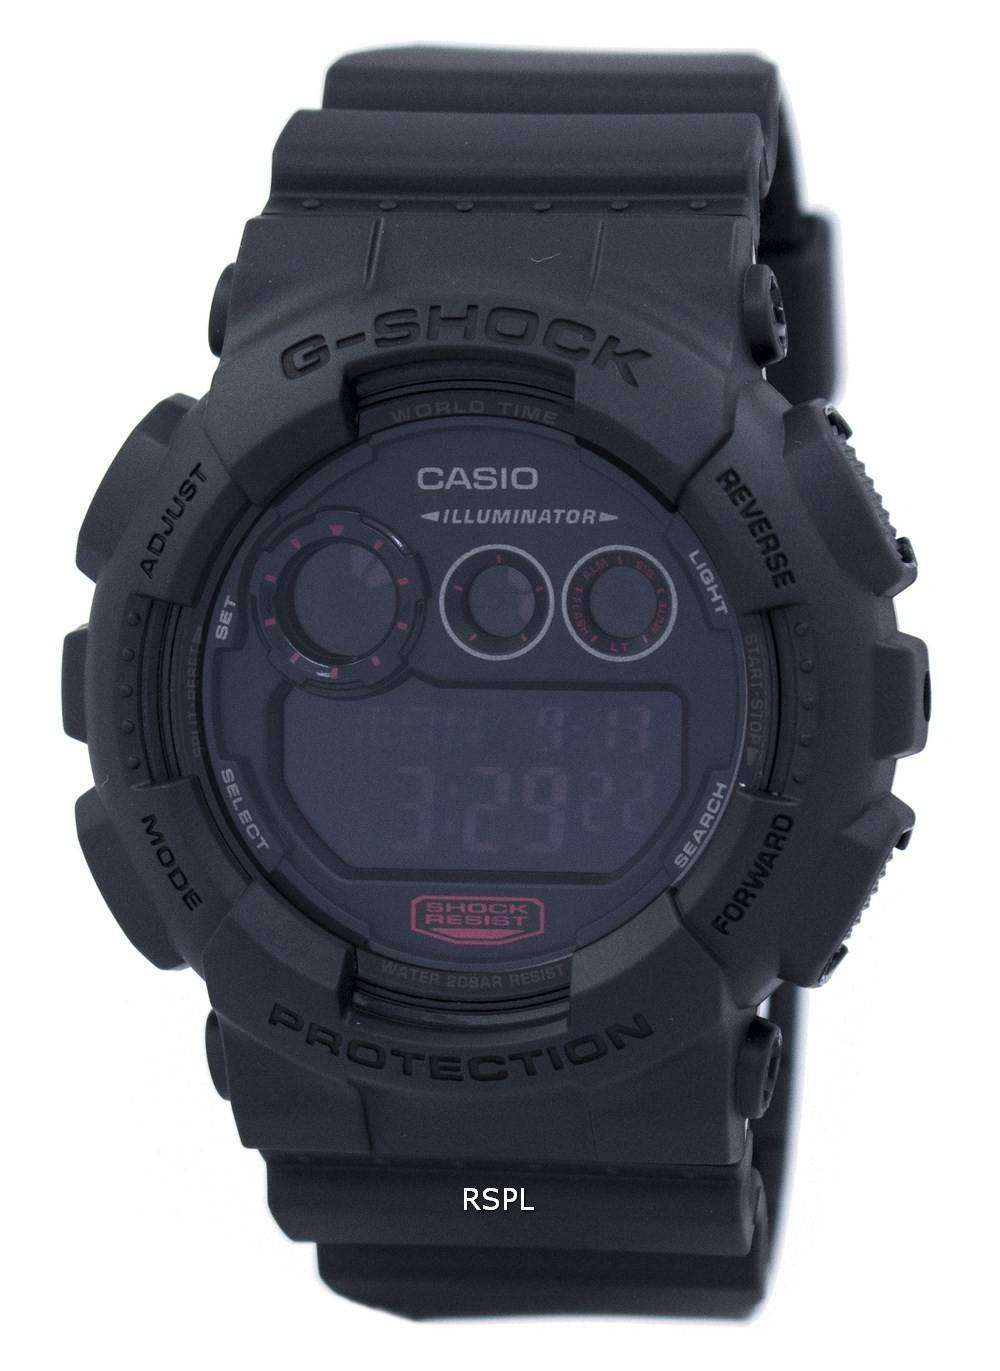 Casio G-Shock Illuminator World Time GD-120MB-1 Mens Watch